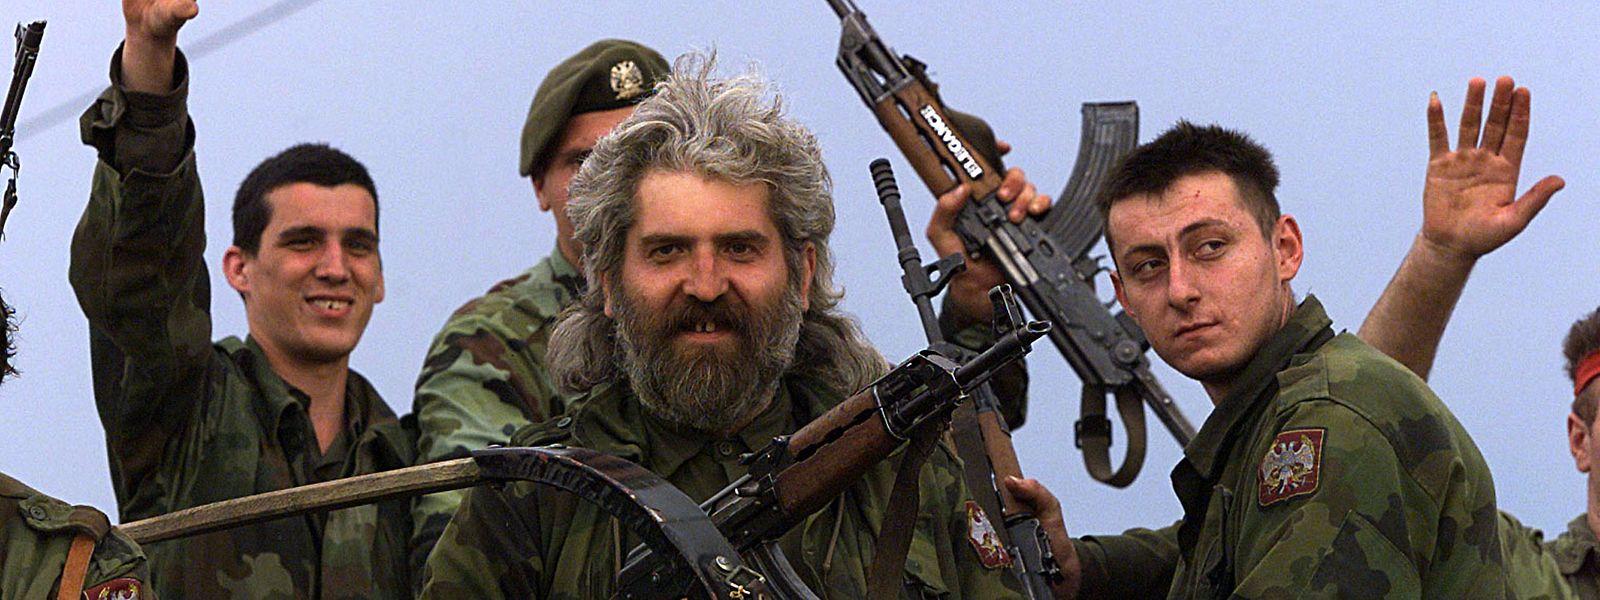 Juni 1991: Serbische Soldaten der jugoslawischen Bundesarmee vor den Toren Sloweniens.